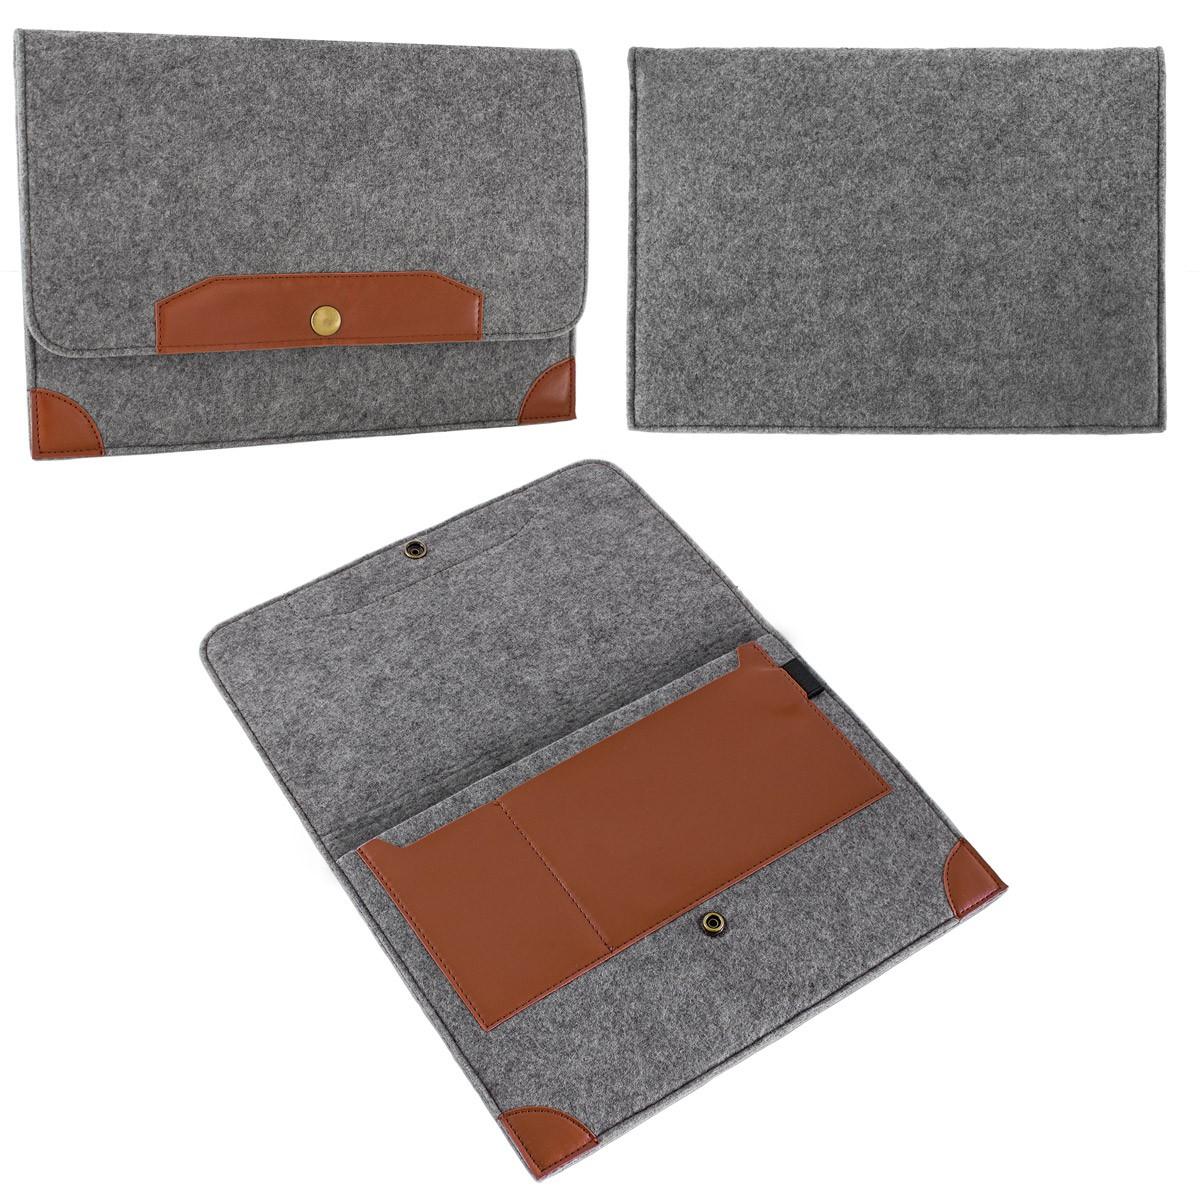 efabrik universal sleeve cover f r tablet 10 12 zoll. Black Bedroom Furniture Sets. Home Design Ideas